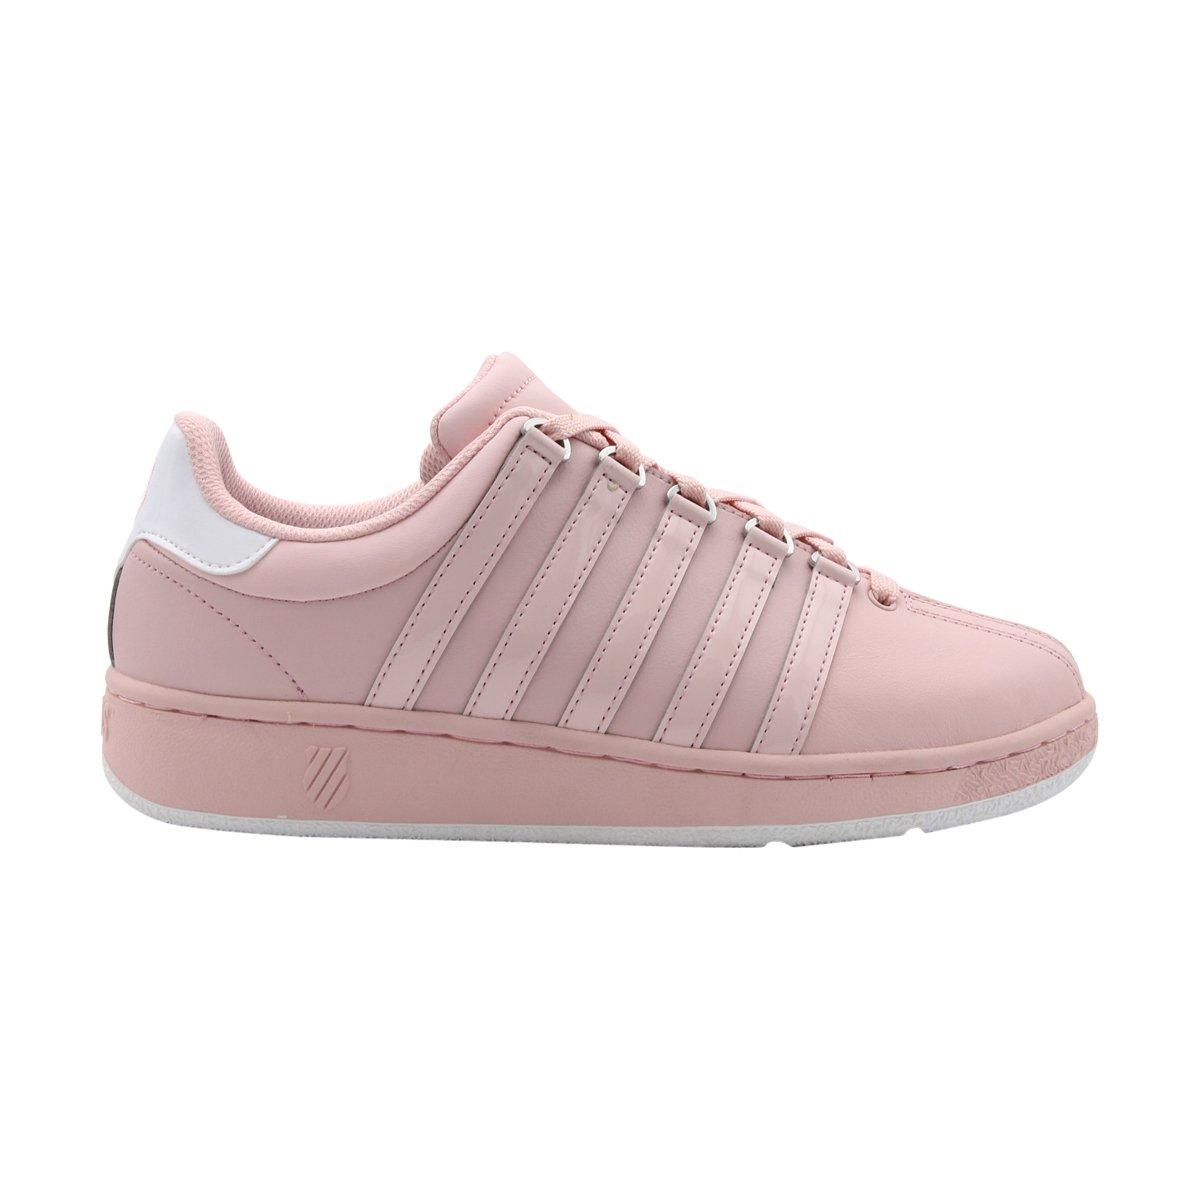 K-Swiss Women's Classic Vn Sneaker B01LXNZXHD 9.5 B(M) US|Potpourri/White